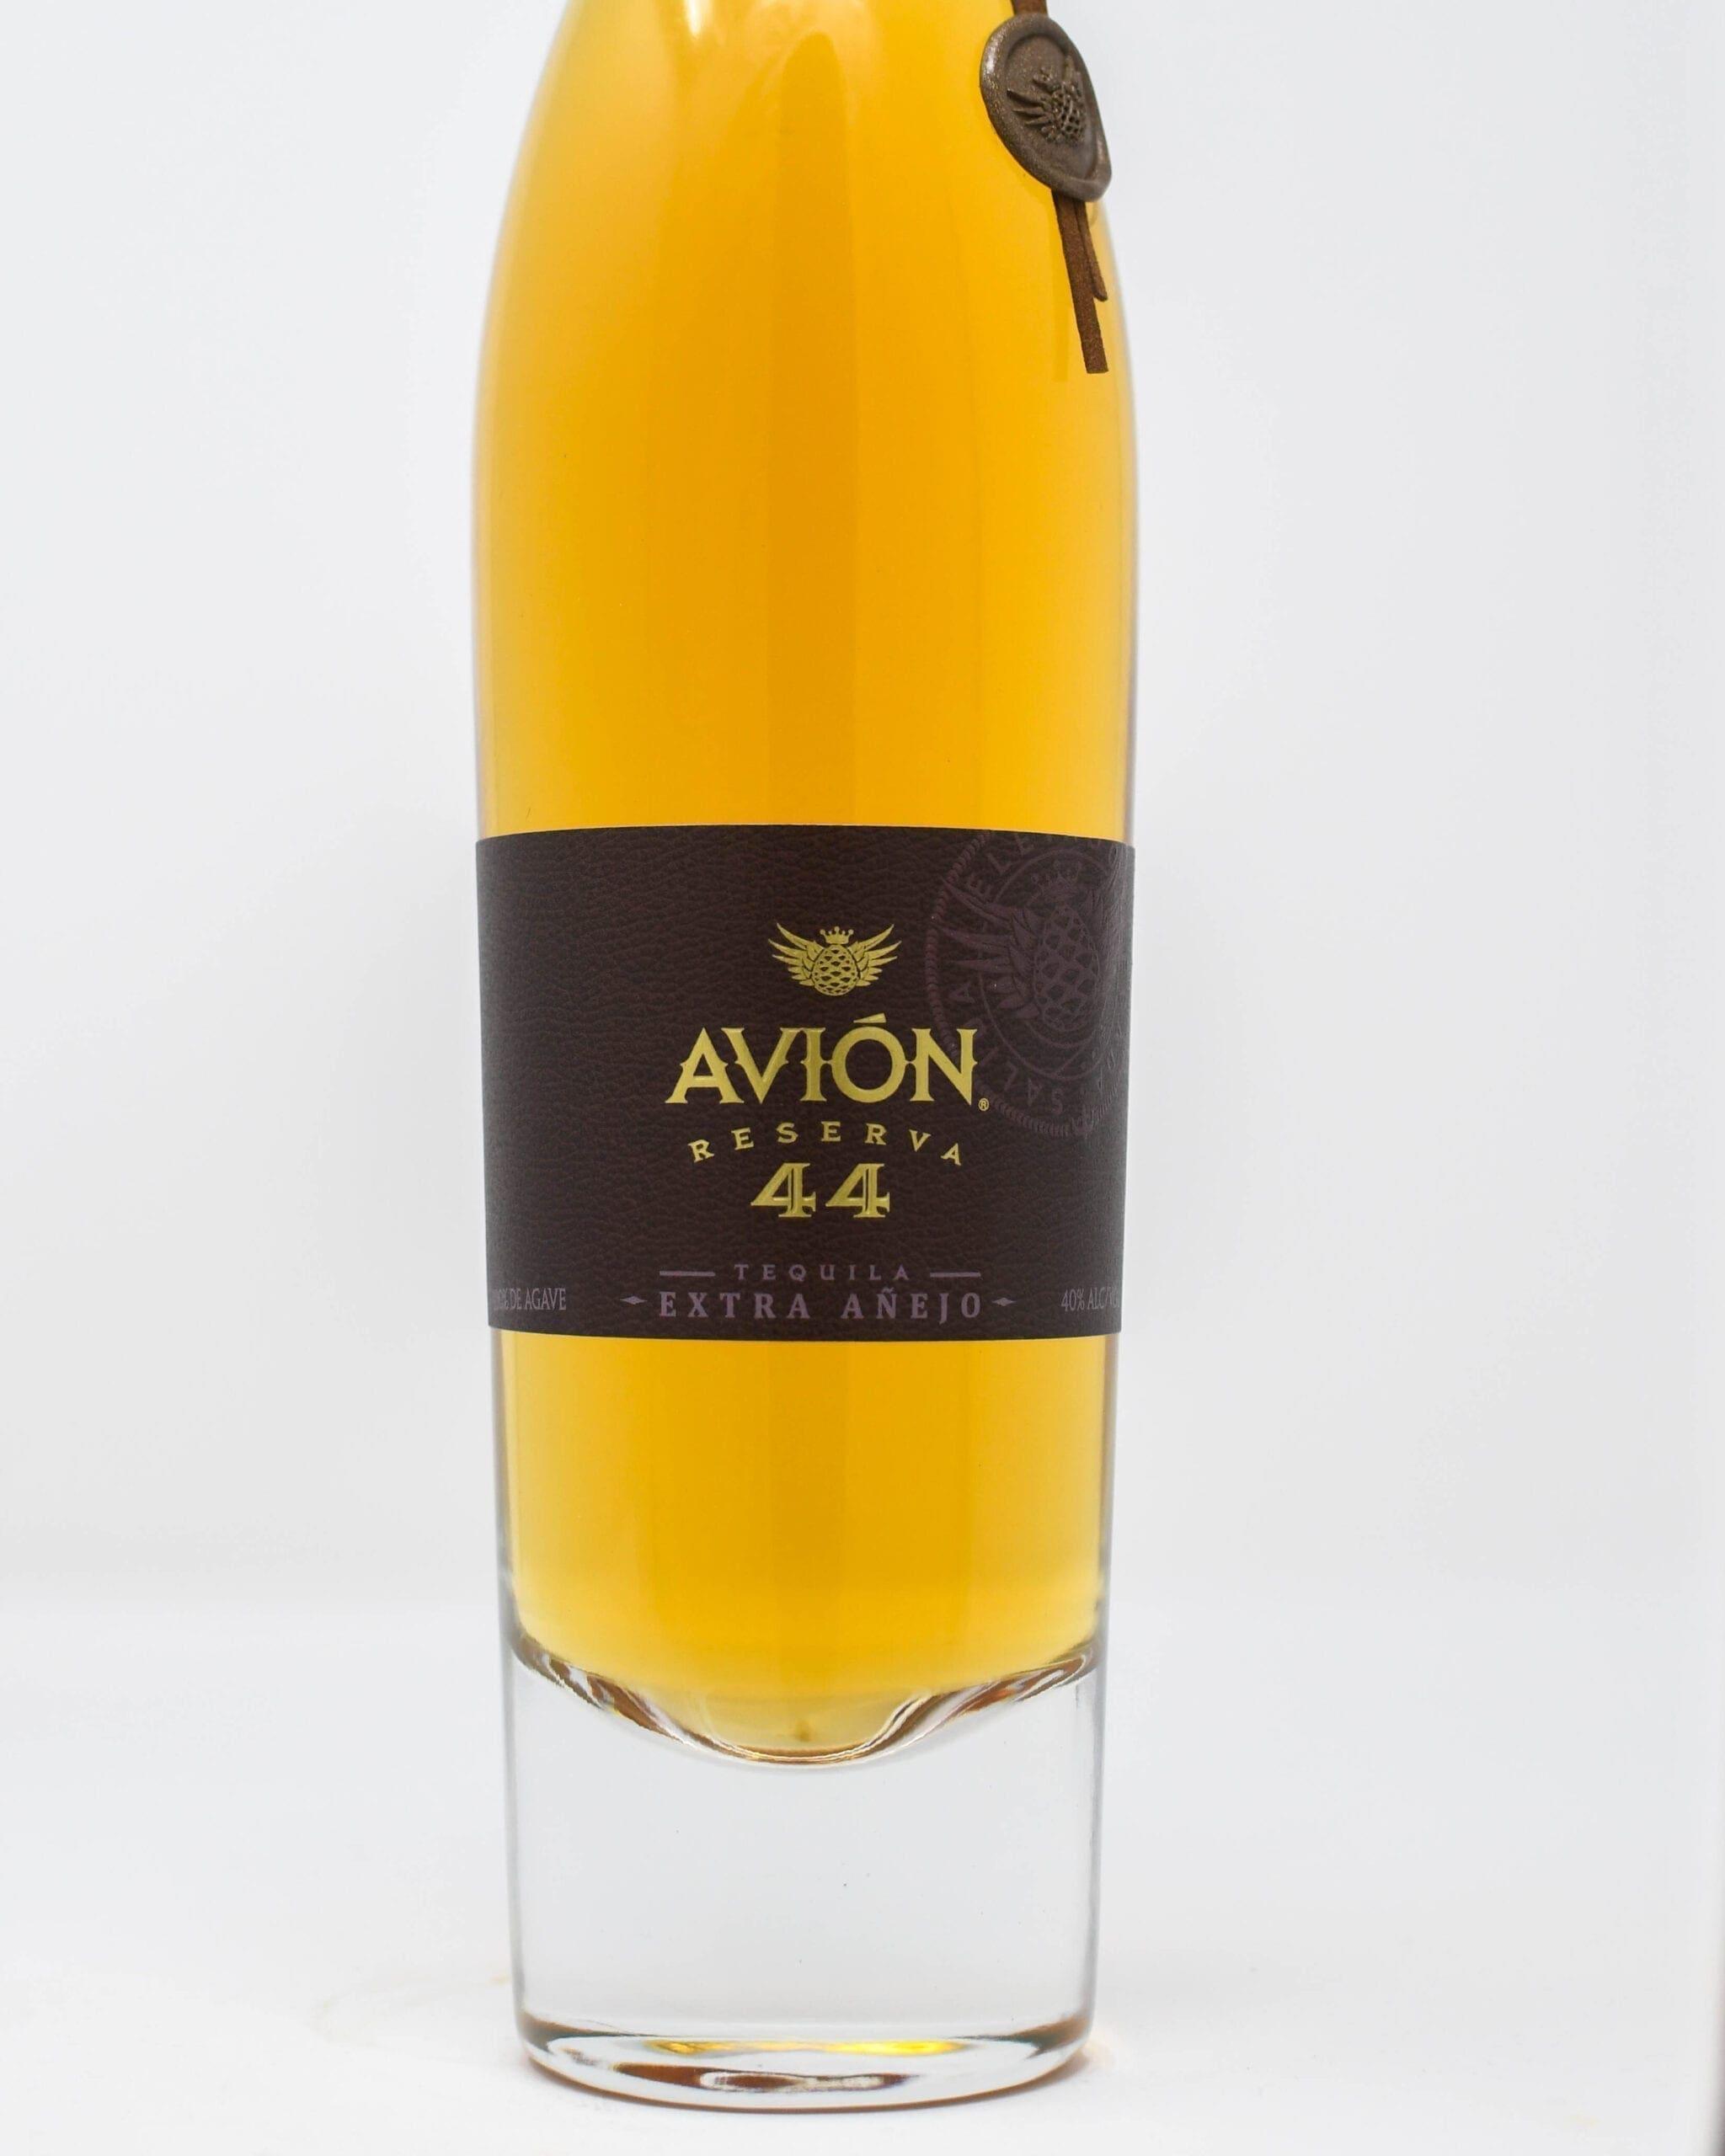 Avion Reserva 44, Tequila Extra Anejo